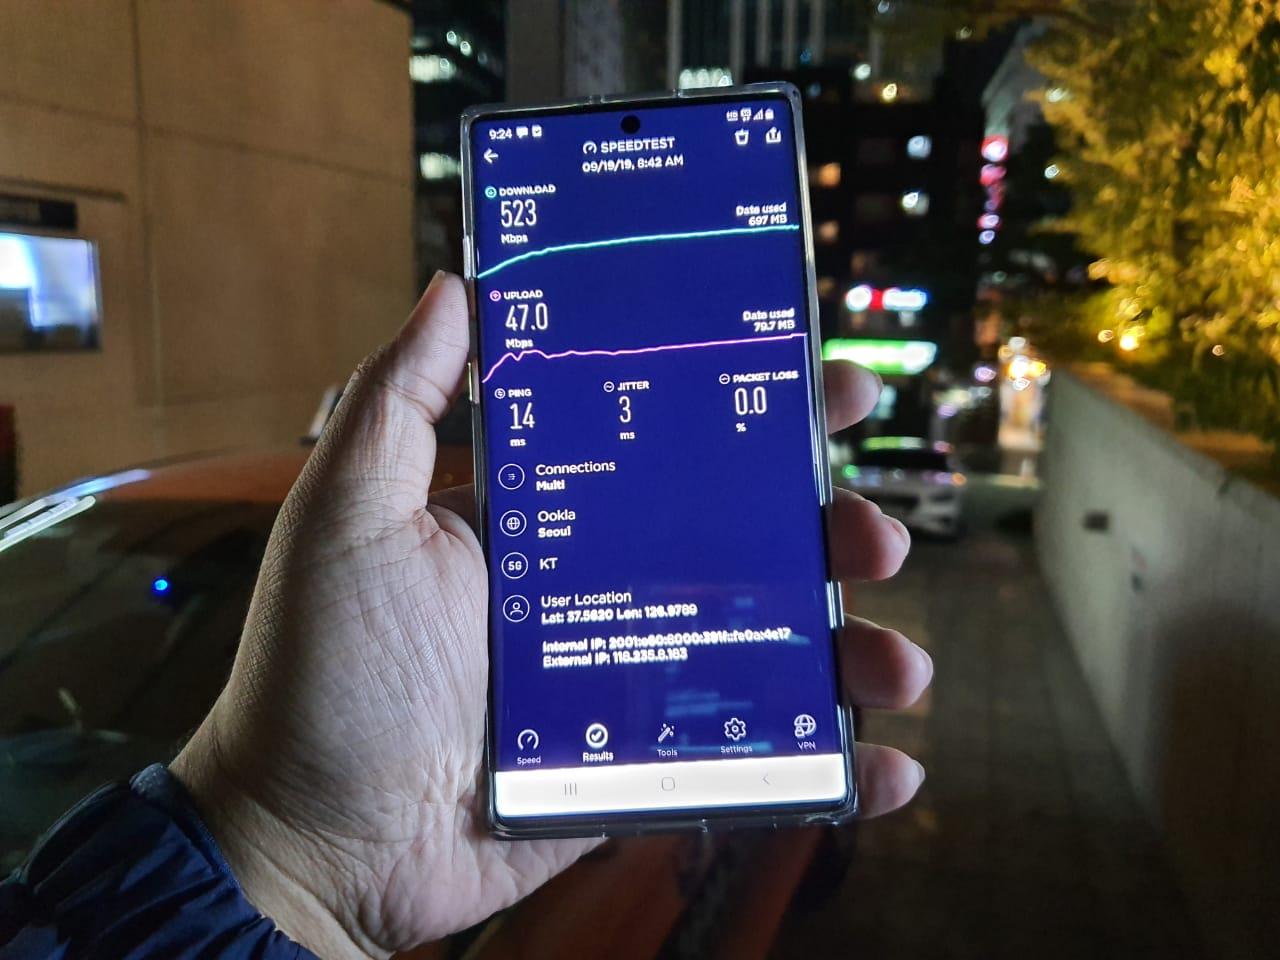 Mencicipi Jaringan 5G via Samsung Galaxy Note 10 di Korsel